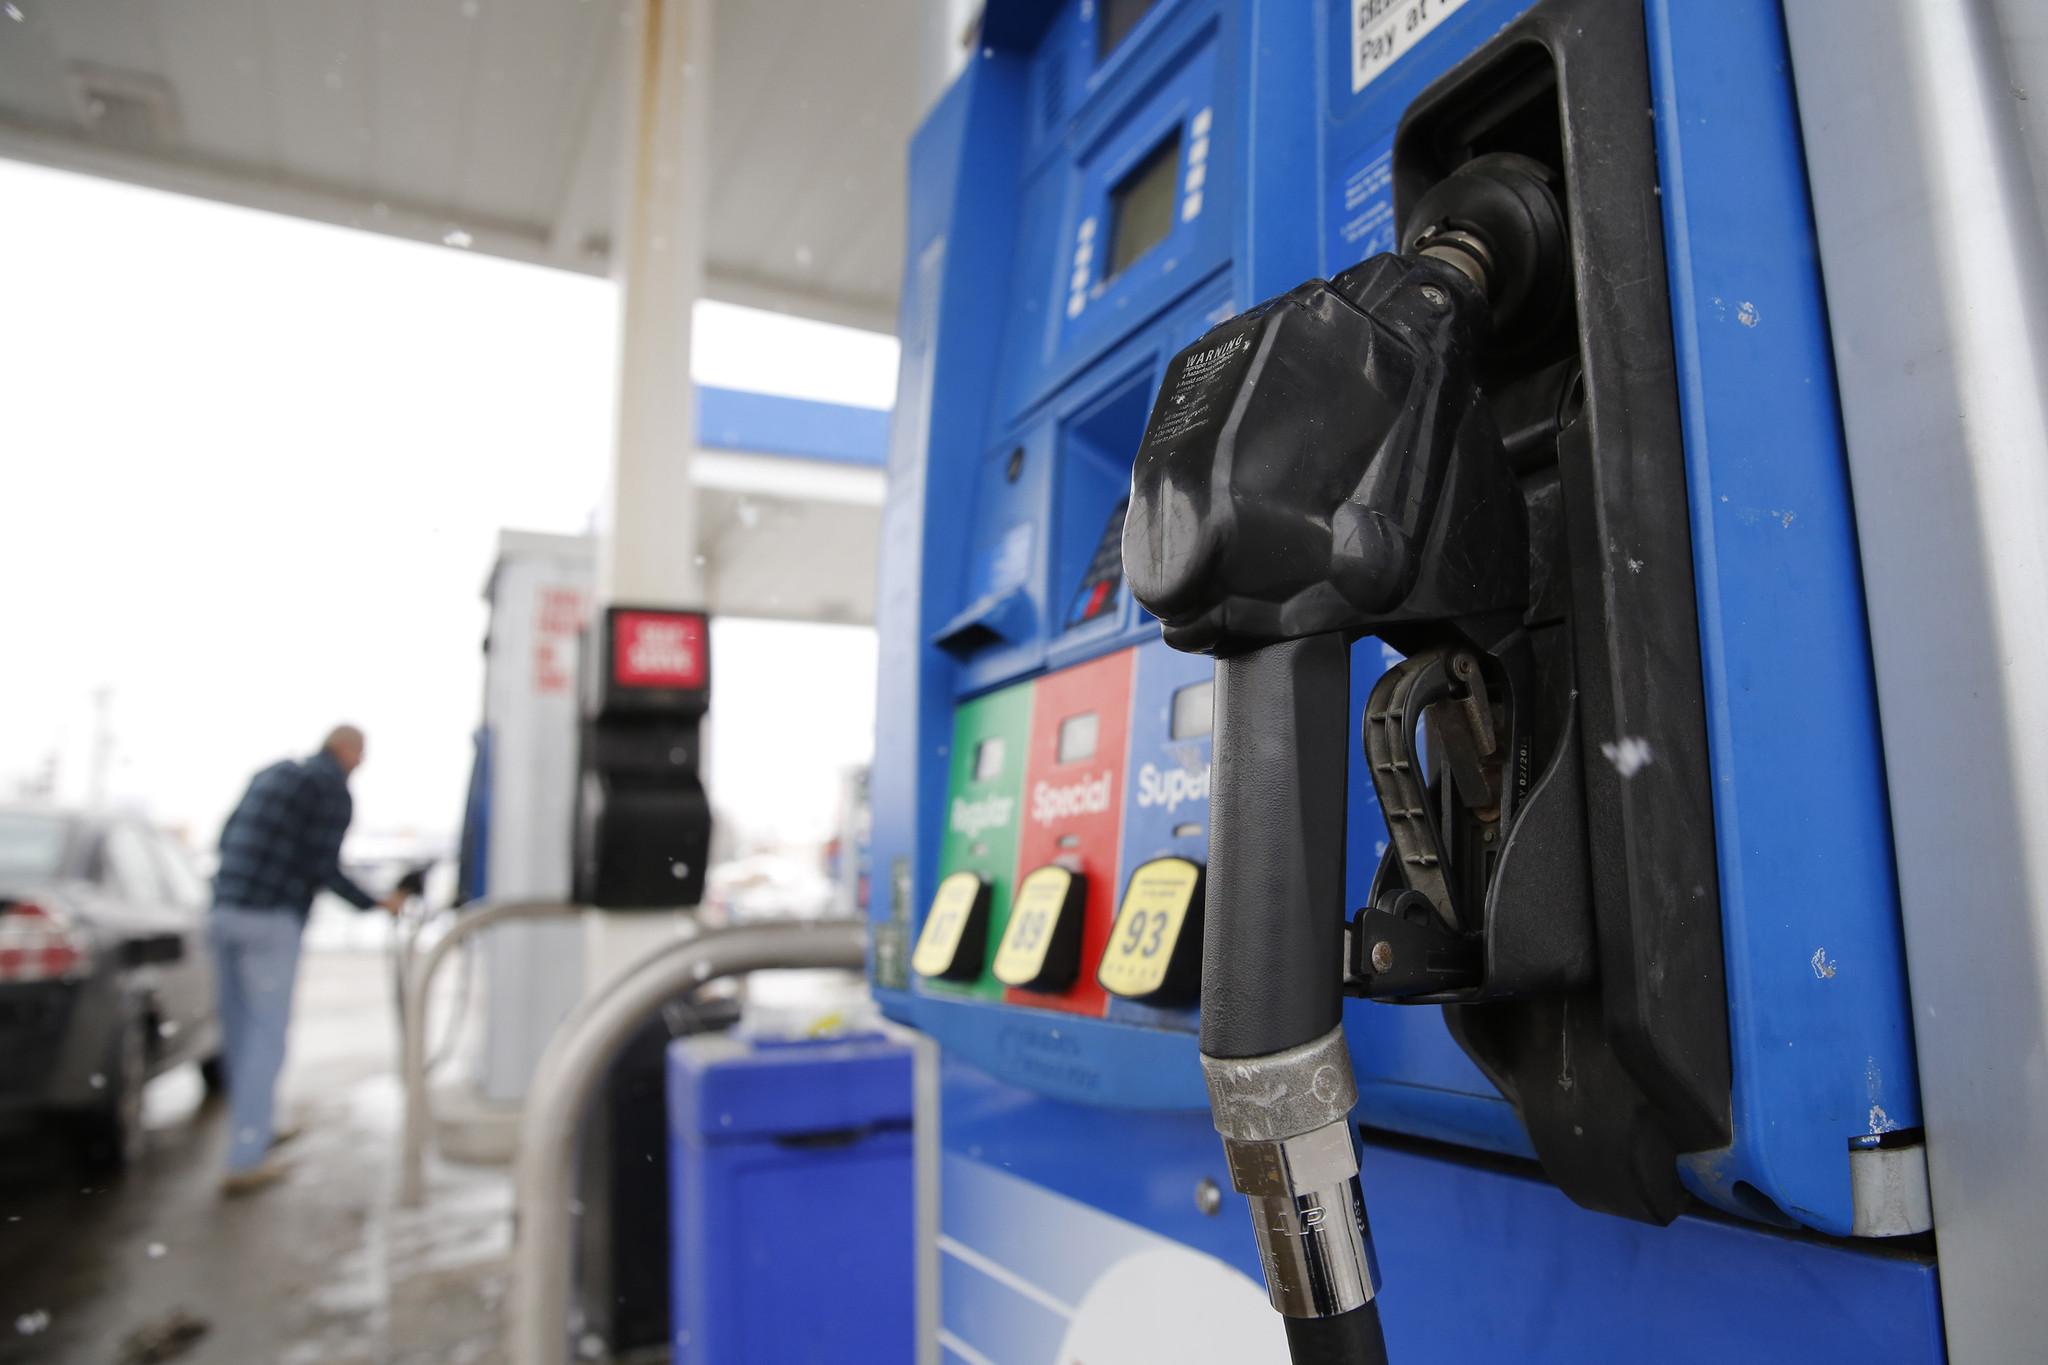 Interest groups pushing gas tax overhaul to fix Illinois roads - Chicago Tribune